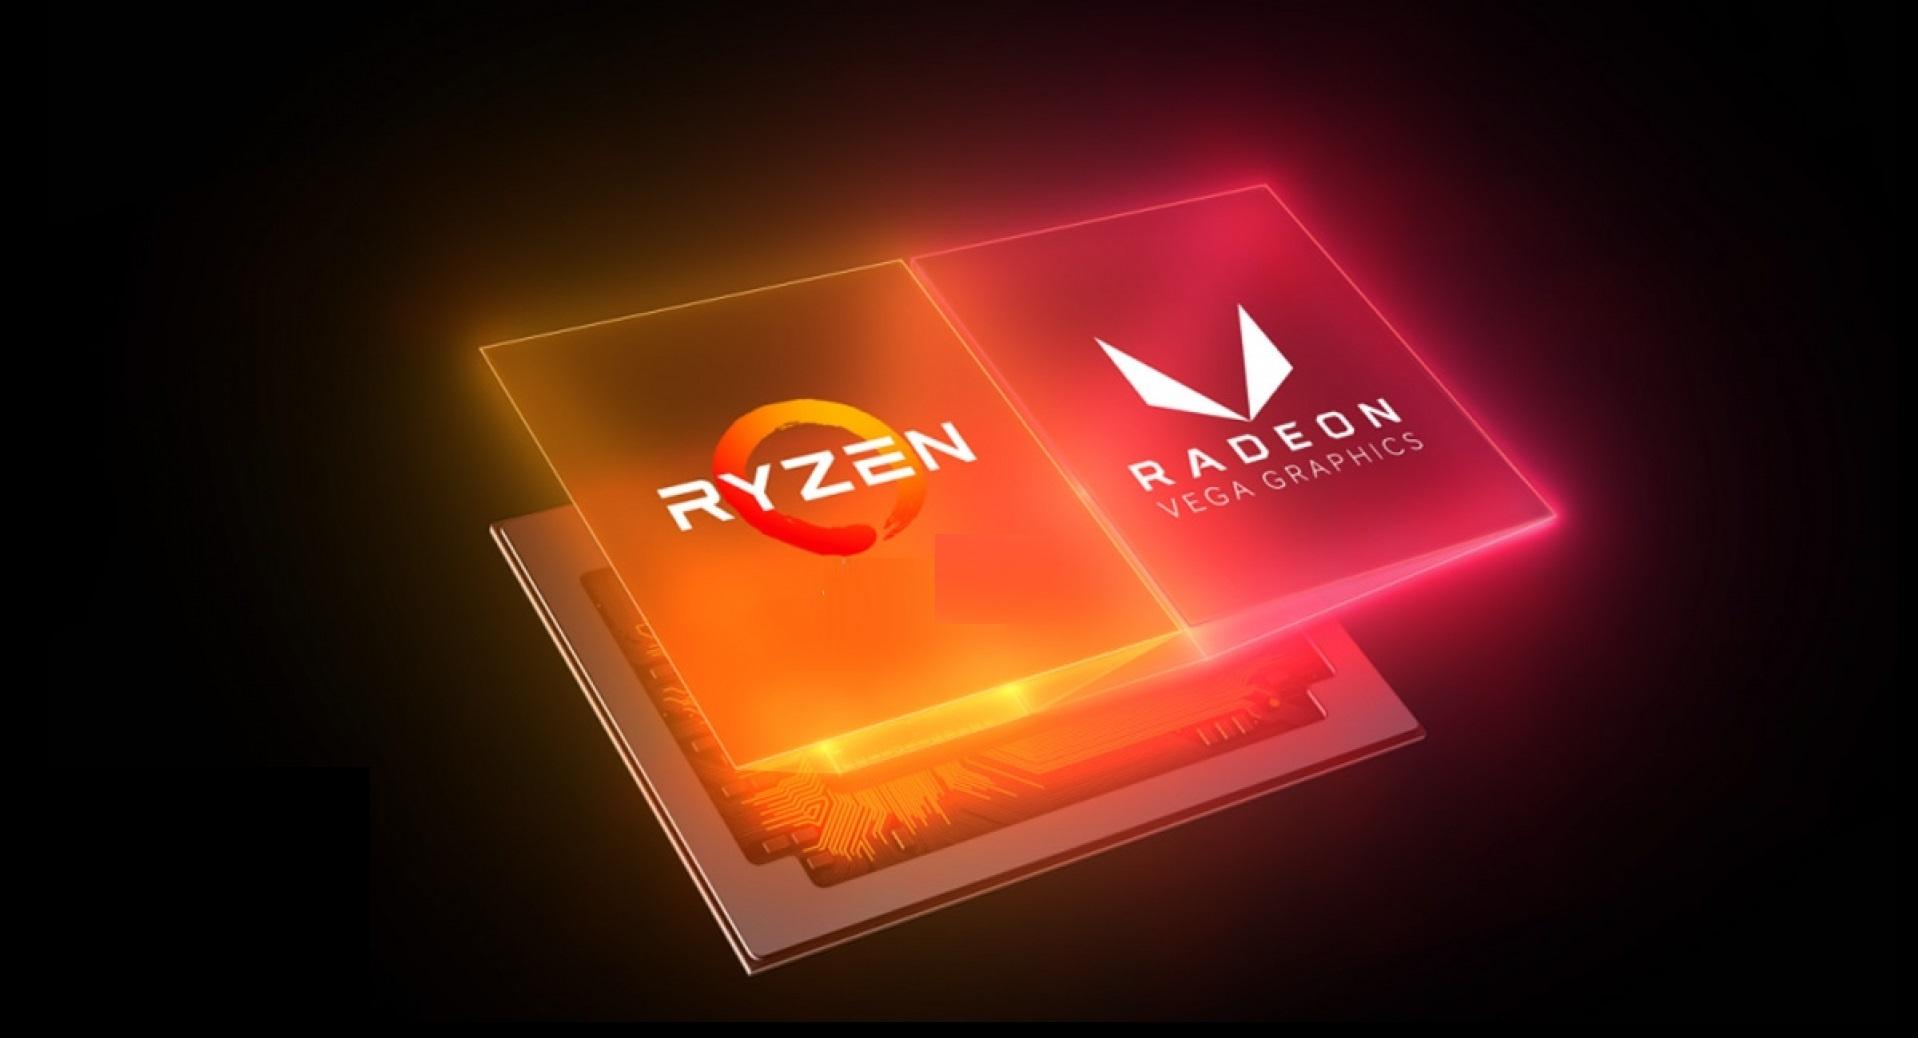 Microsoft заинтересовалась процессорами AMD для своих проектов